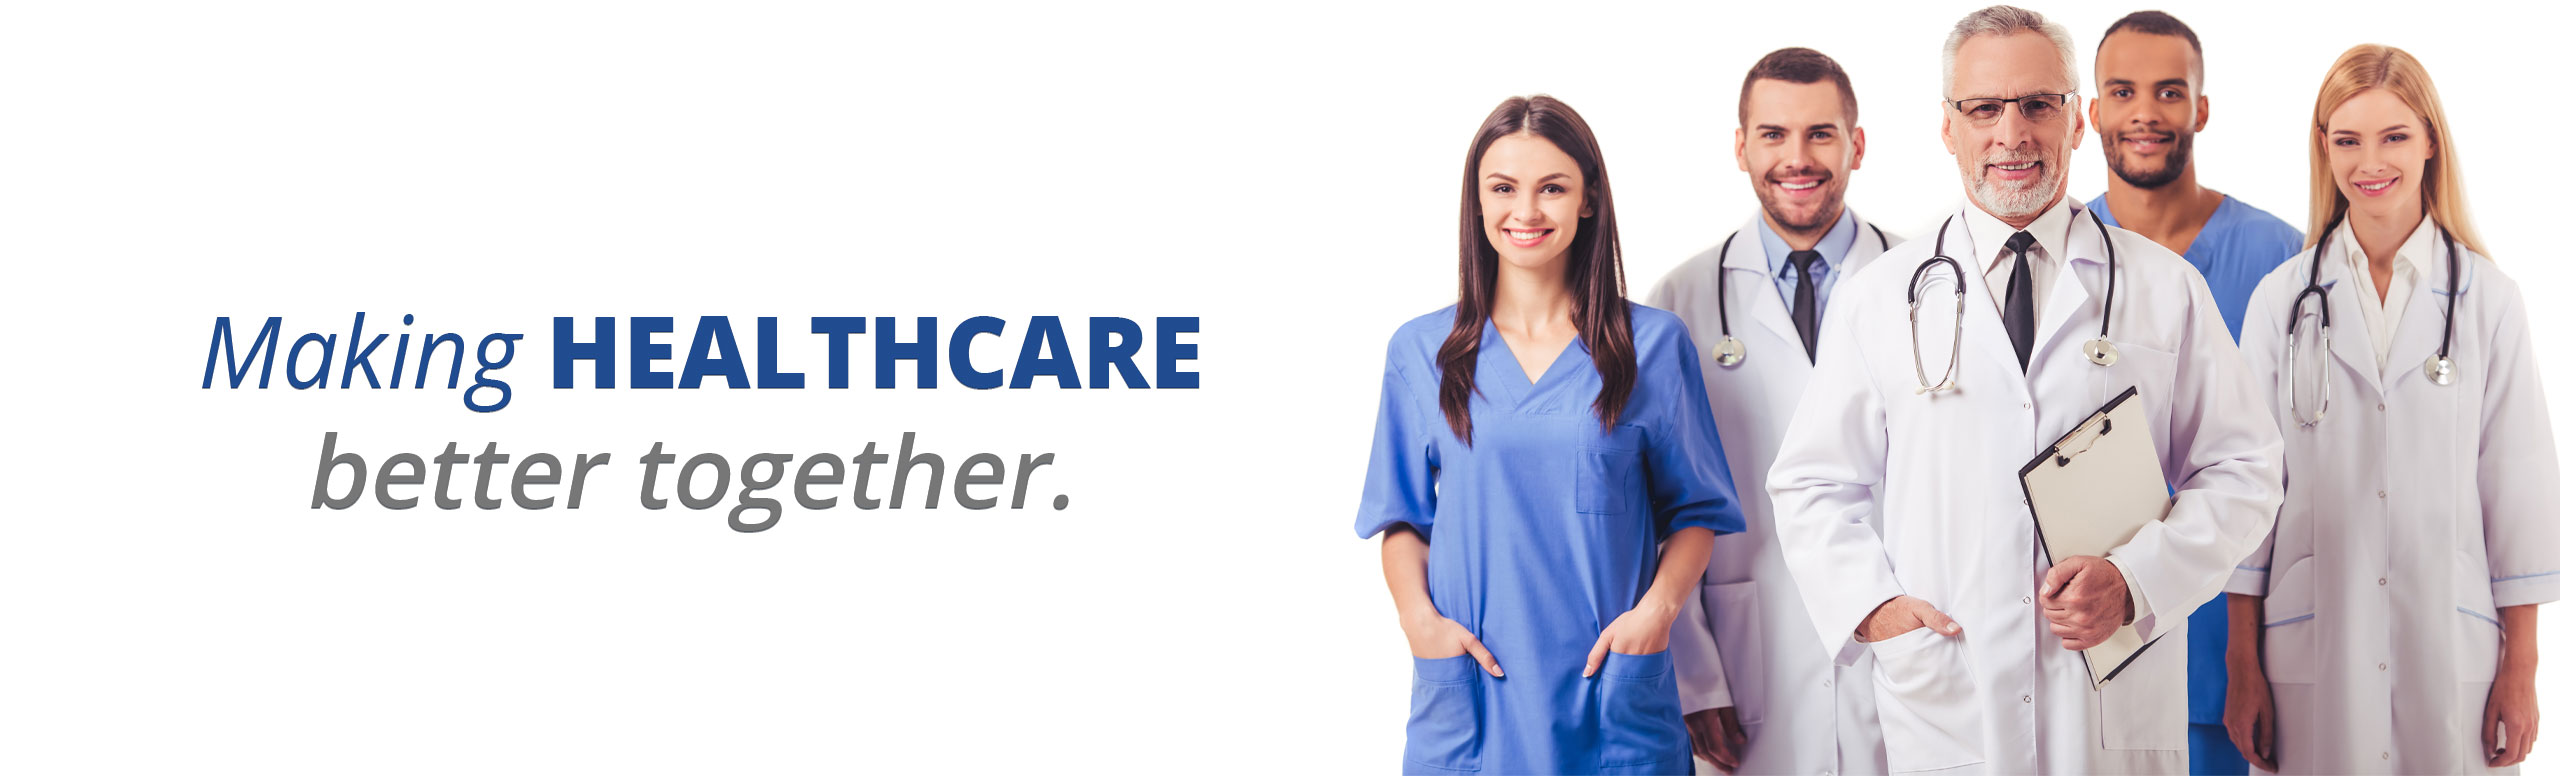 Making Healthcare better together.